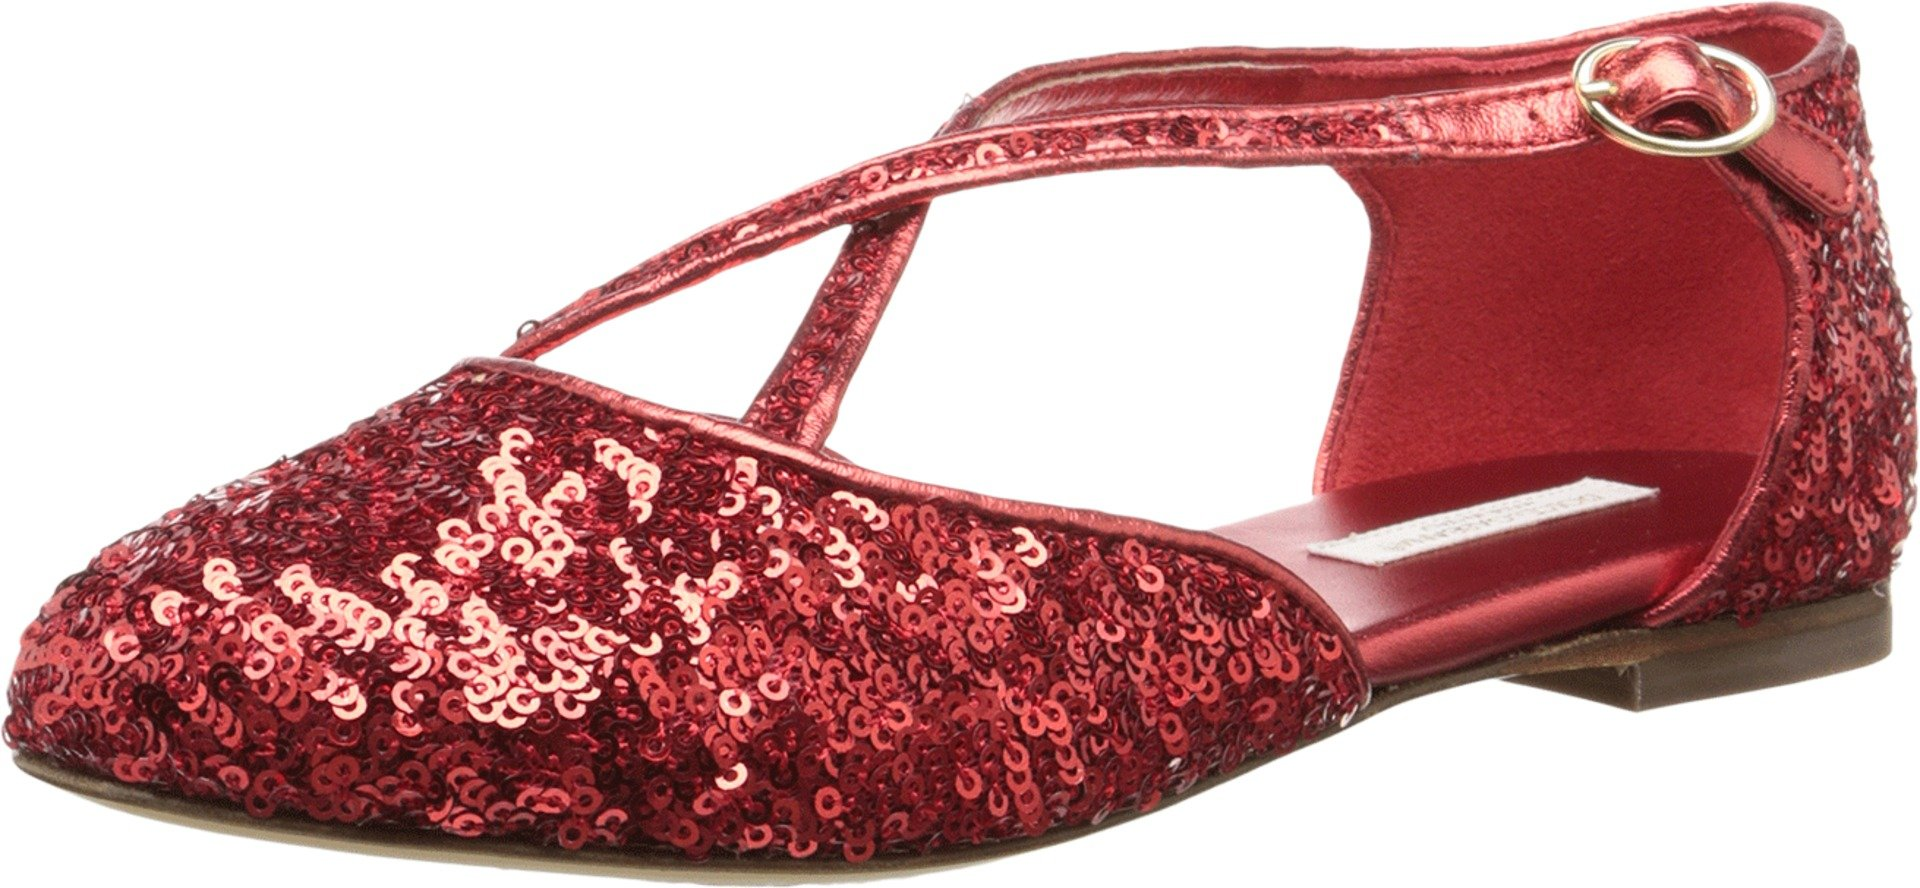 Dolce & Gabbana Kids Girl's Paillettes Sandal (Little Kid/Big Kid) Ruby Red 33 (US 2 Little Kid) M